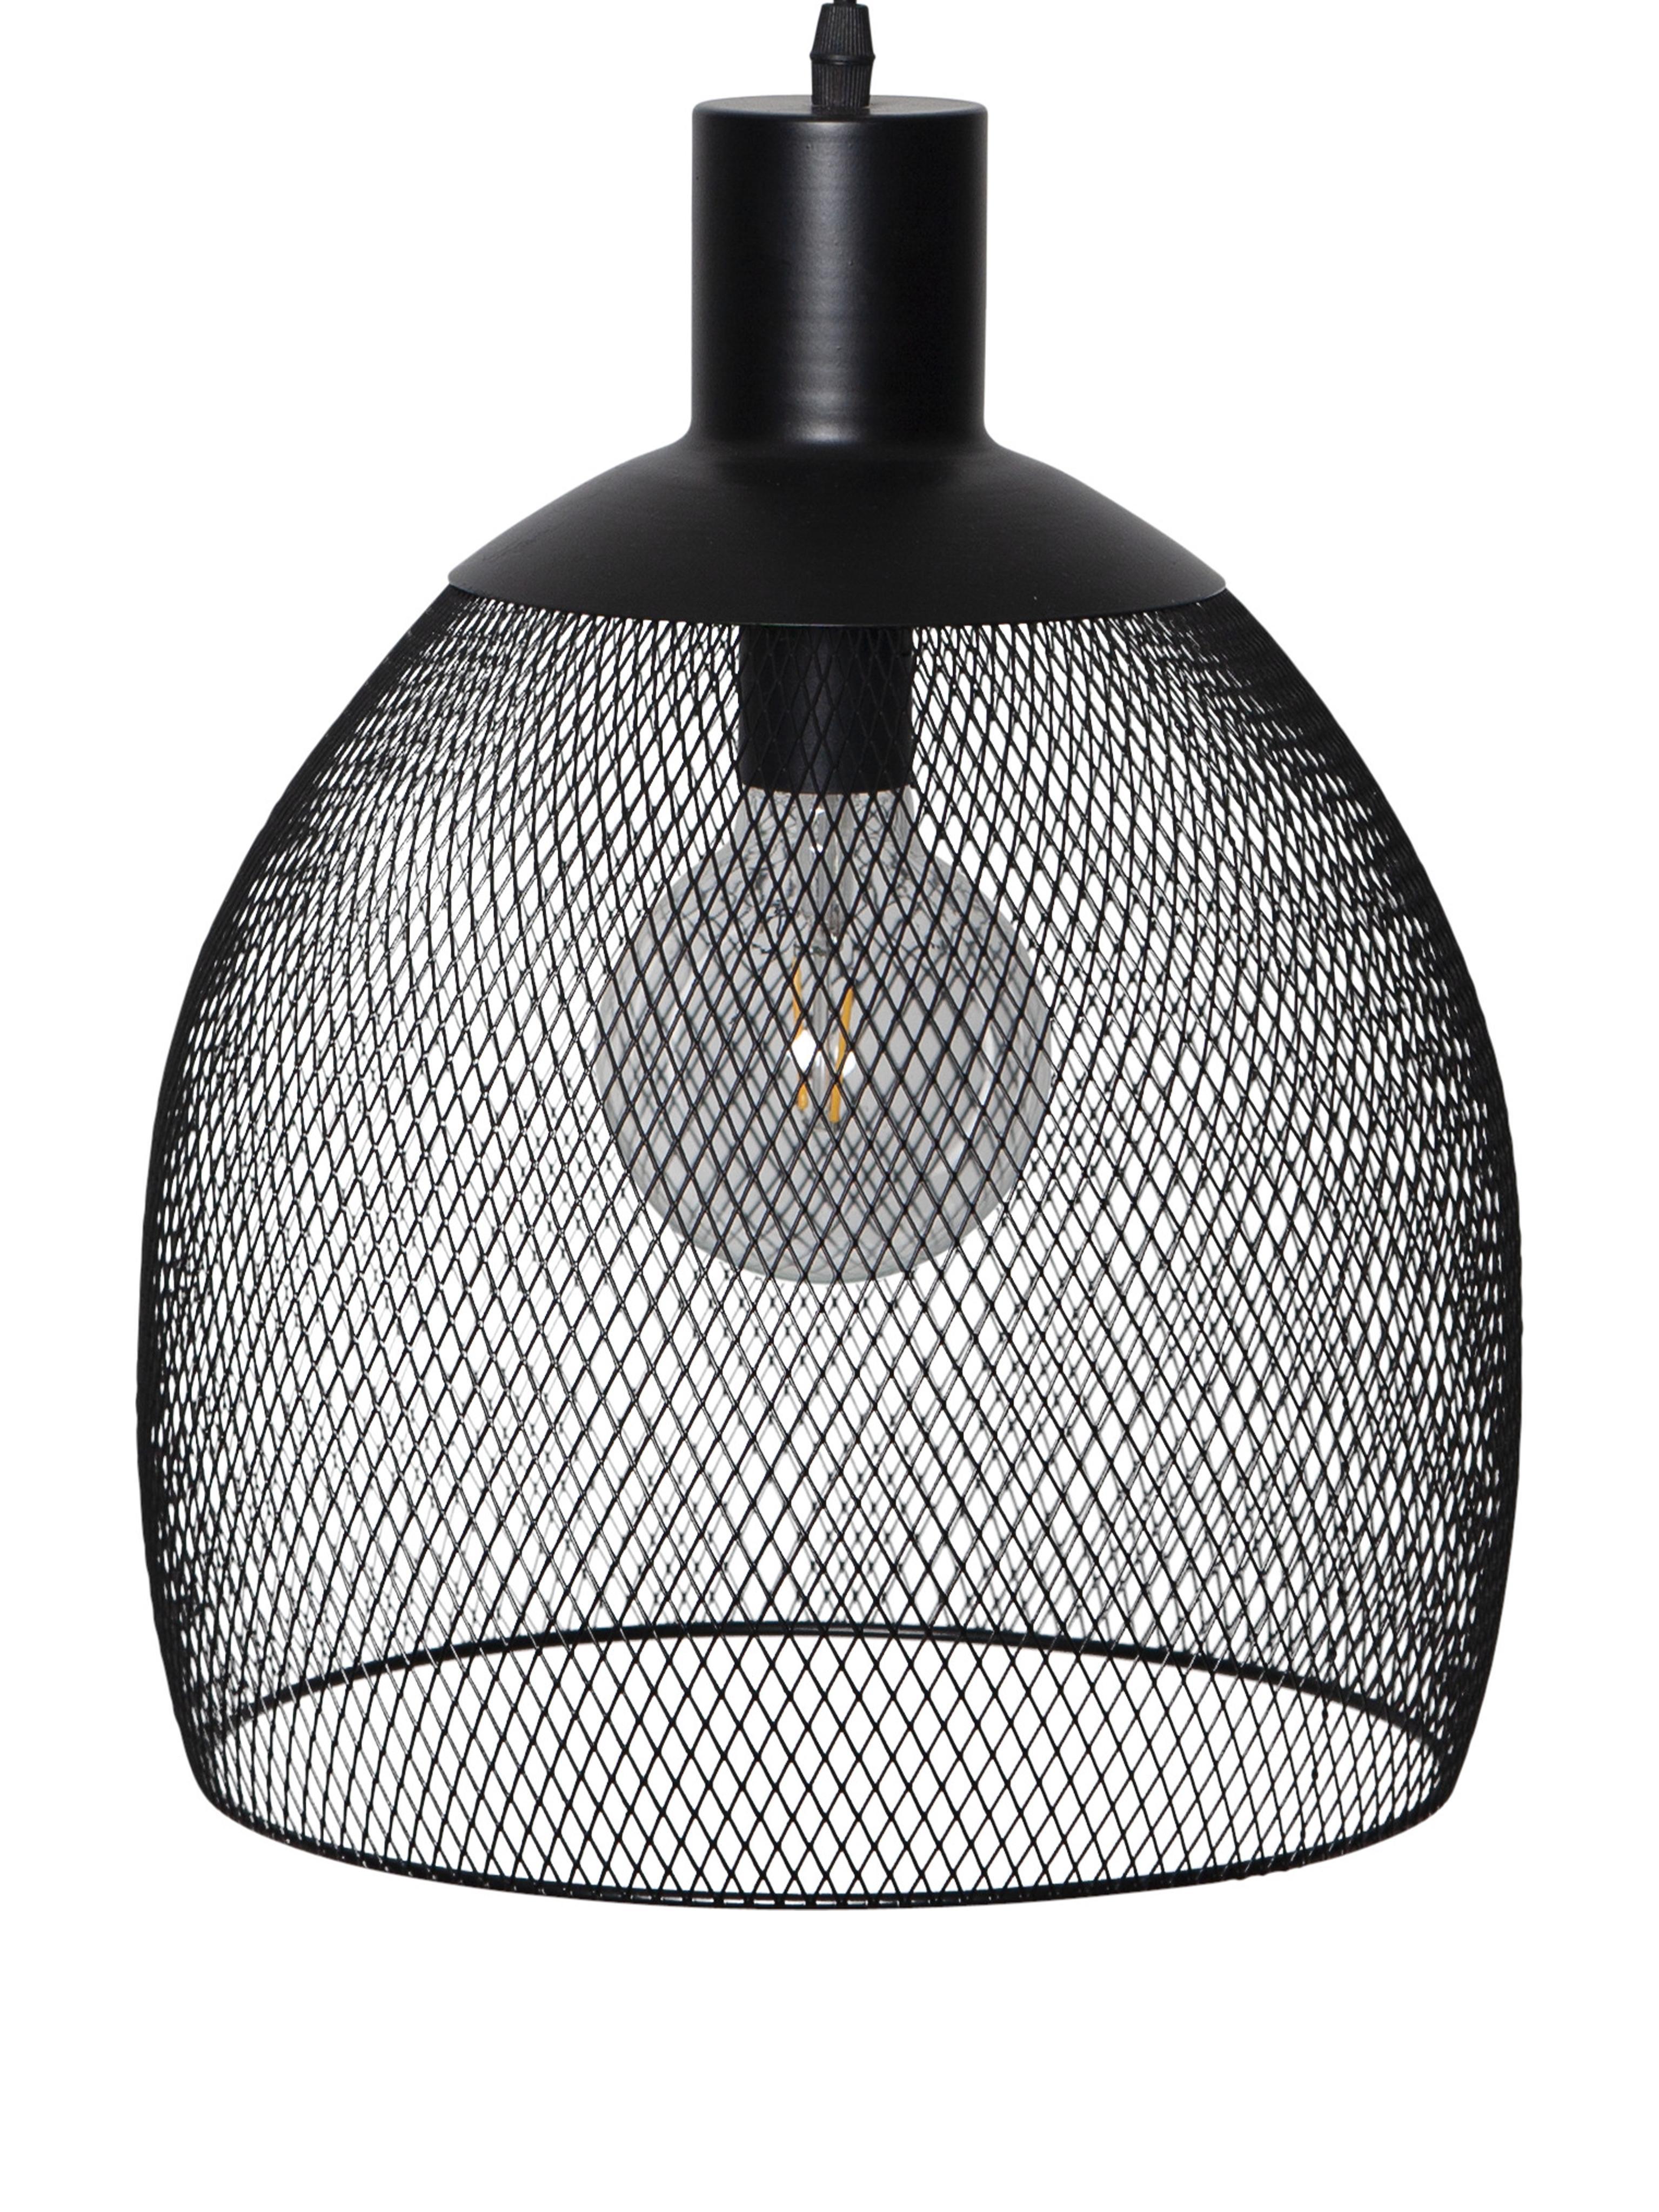 LED Solar-Aussenleuchte Sunlight, Schwarz, Ø 29 x H 35 cm